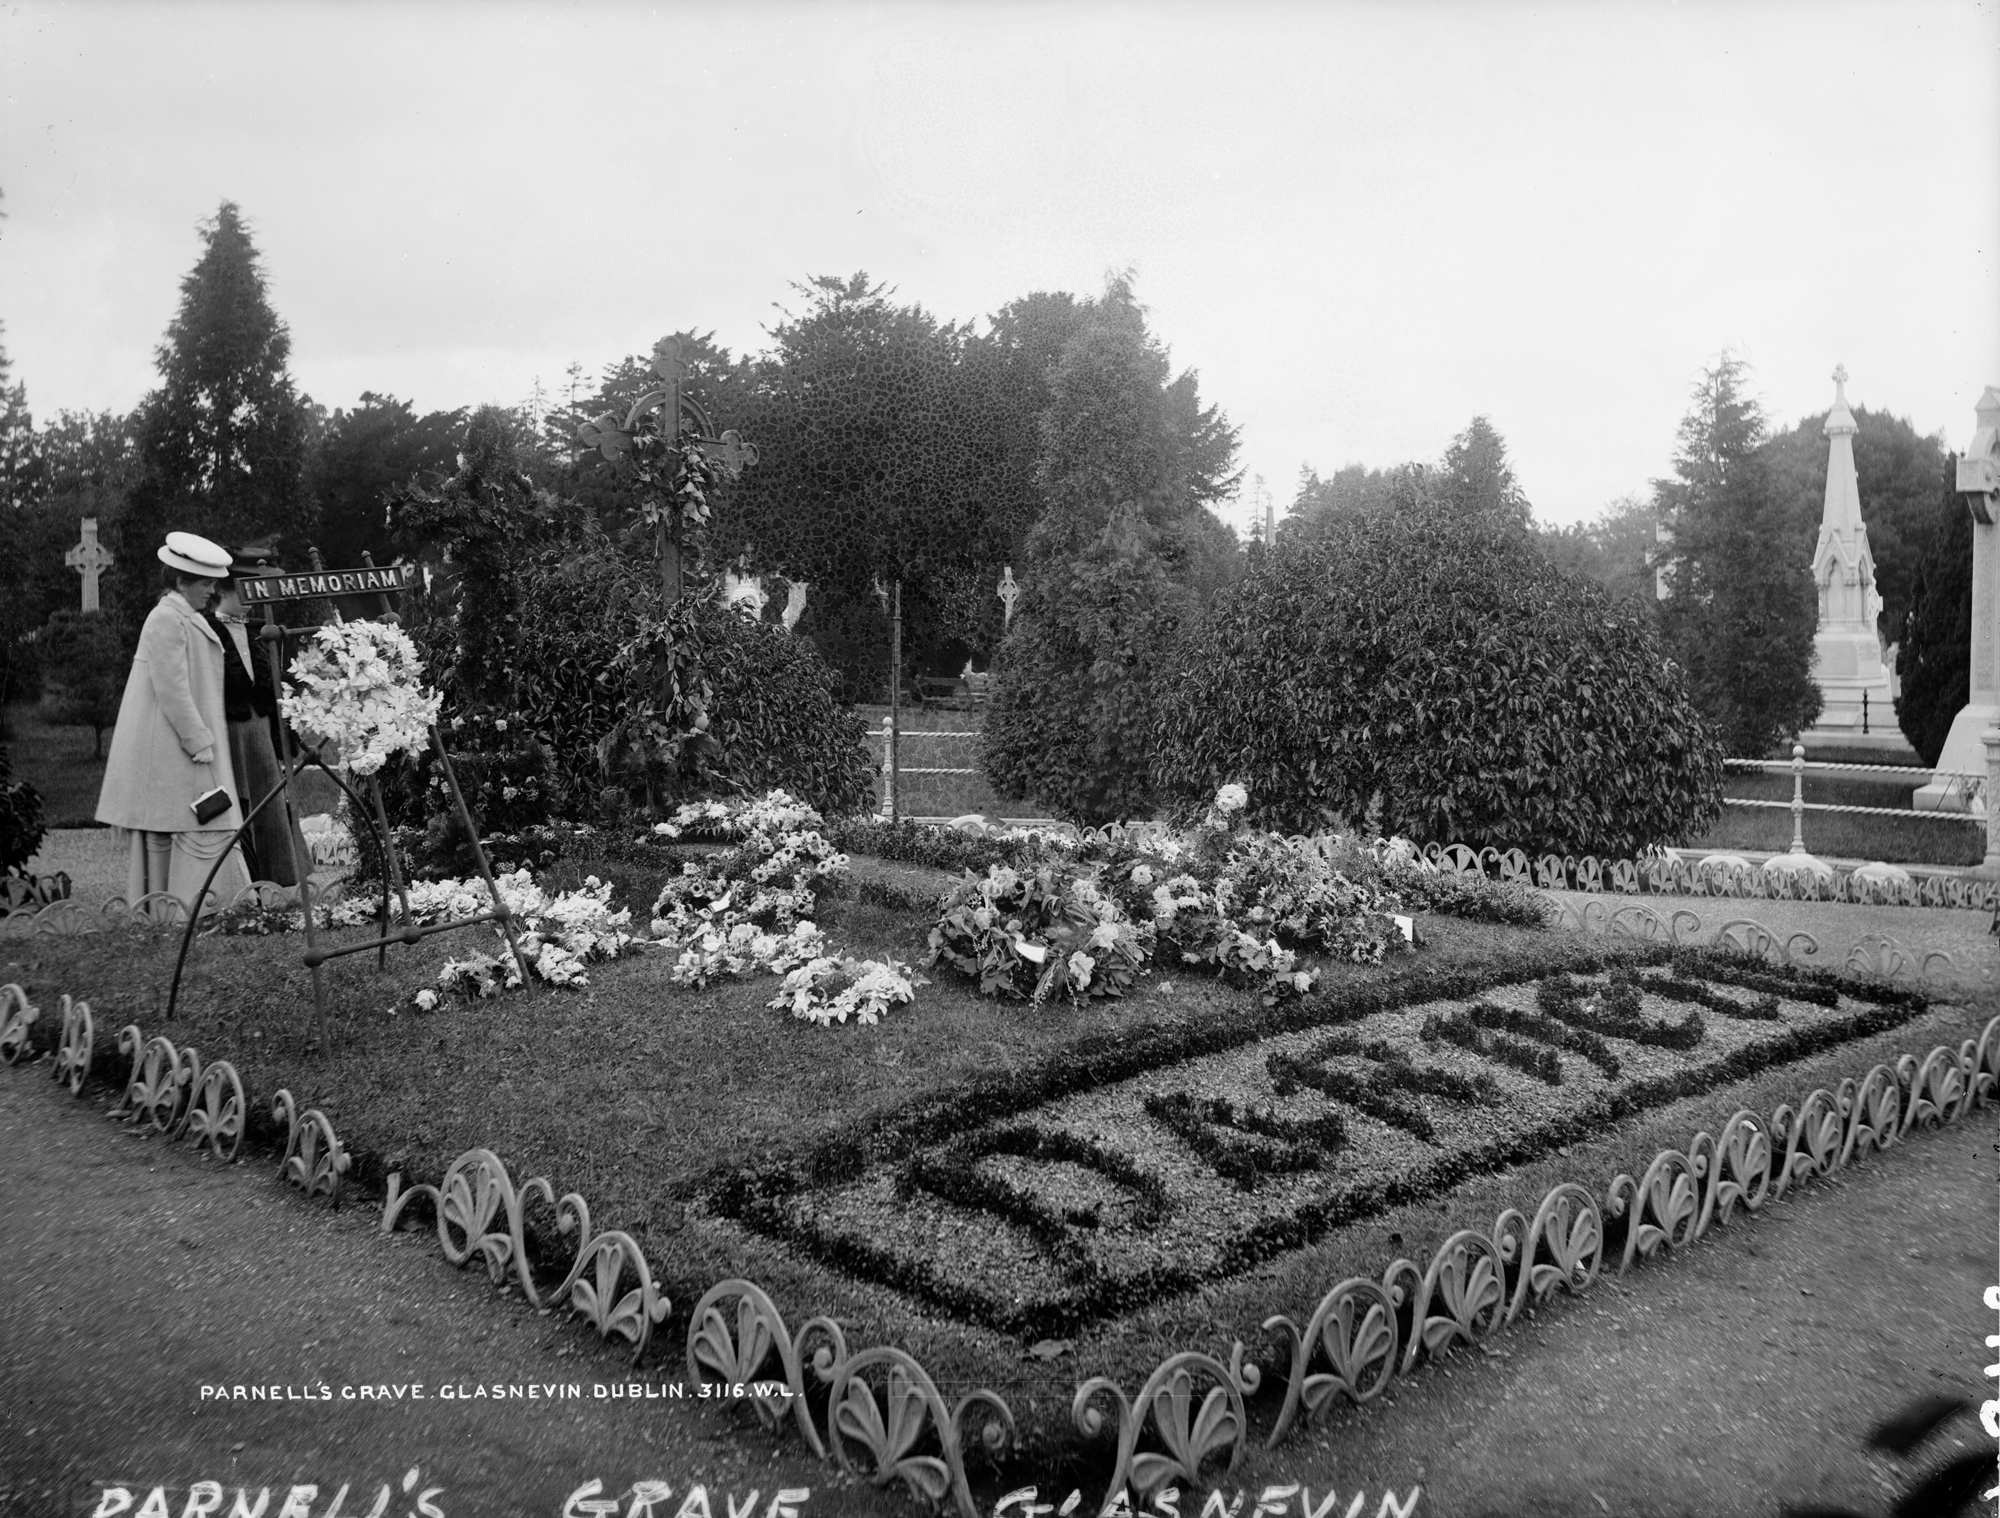 Parnell's Grave, Glasnevin, Co. Dublin